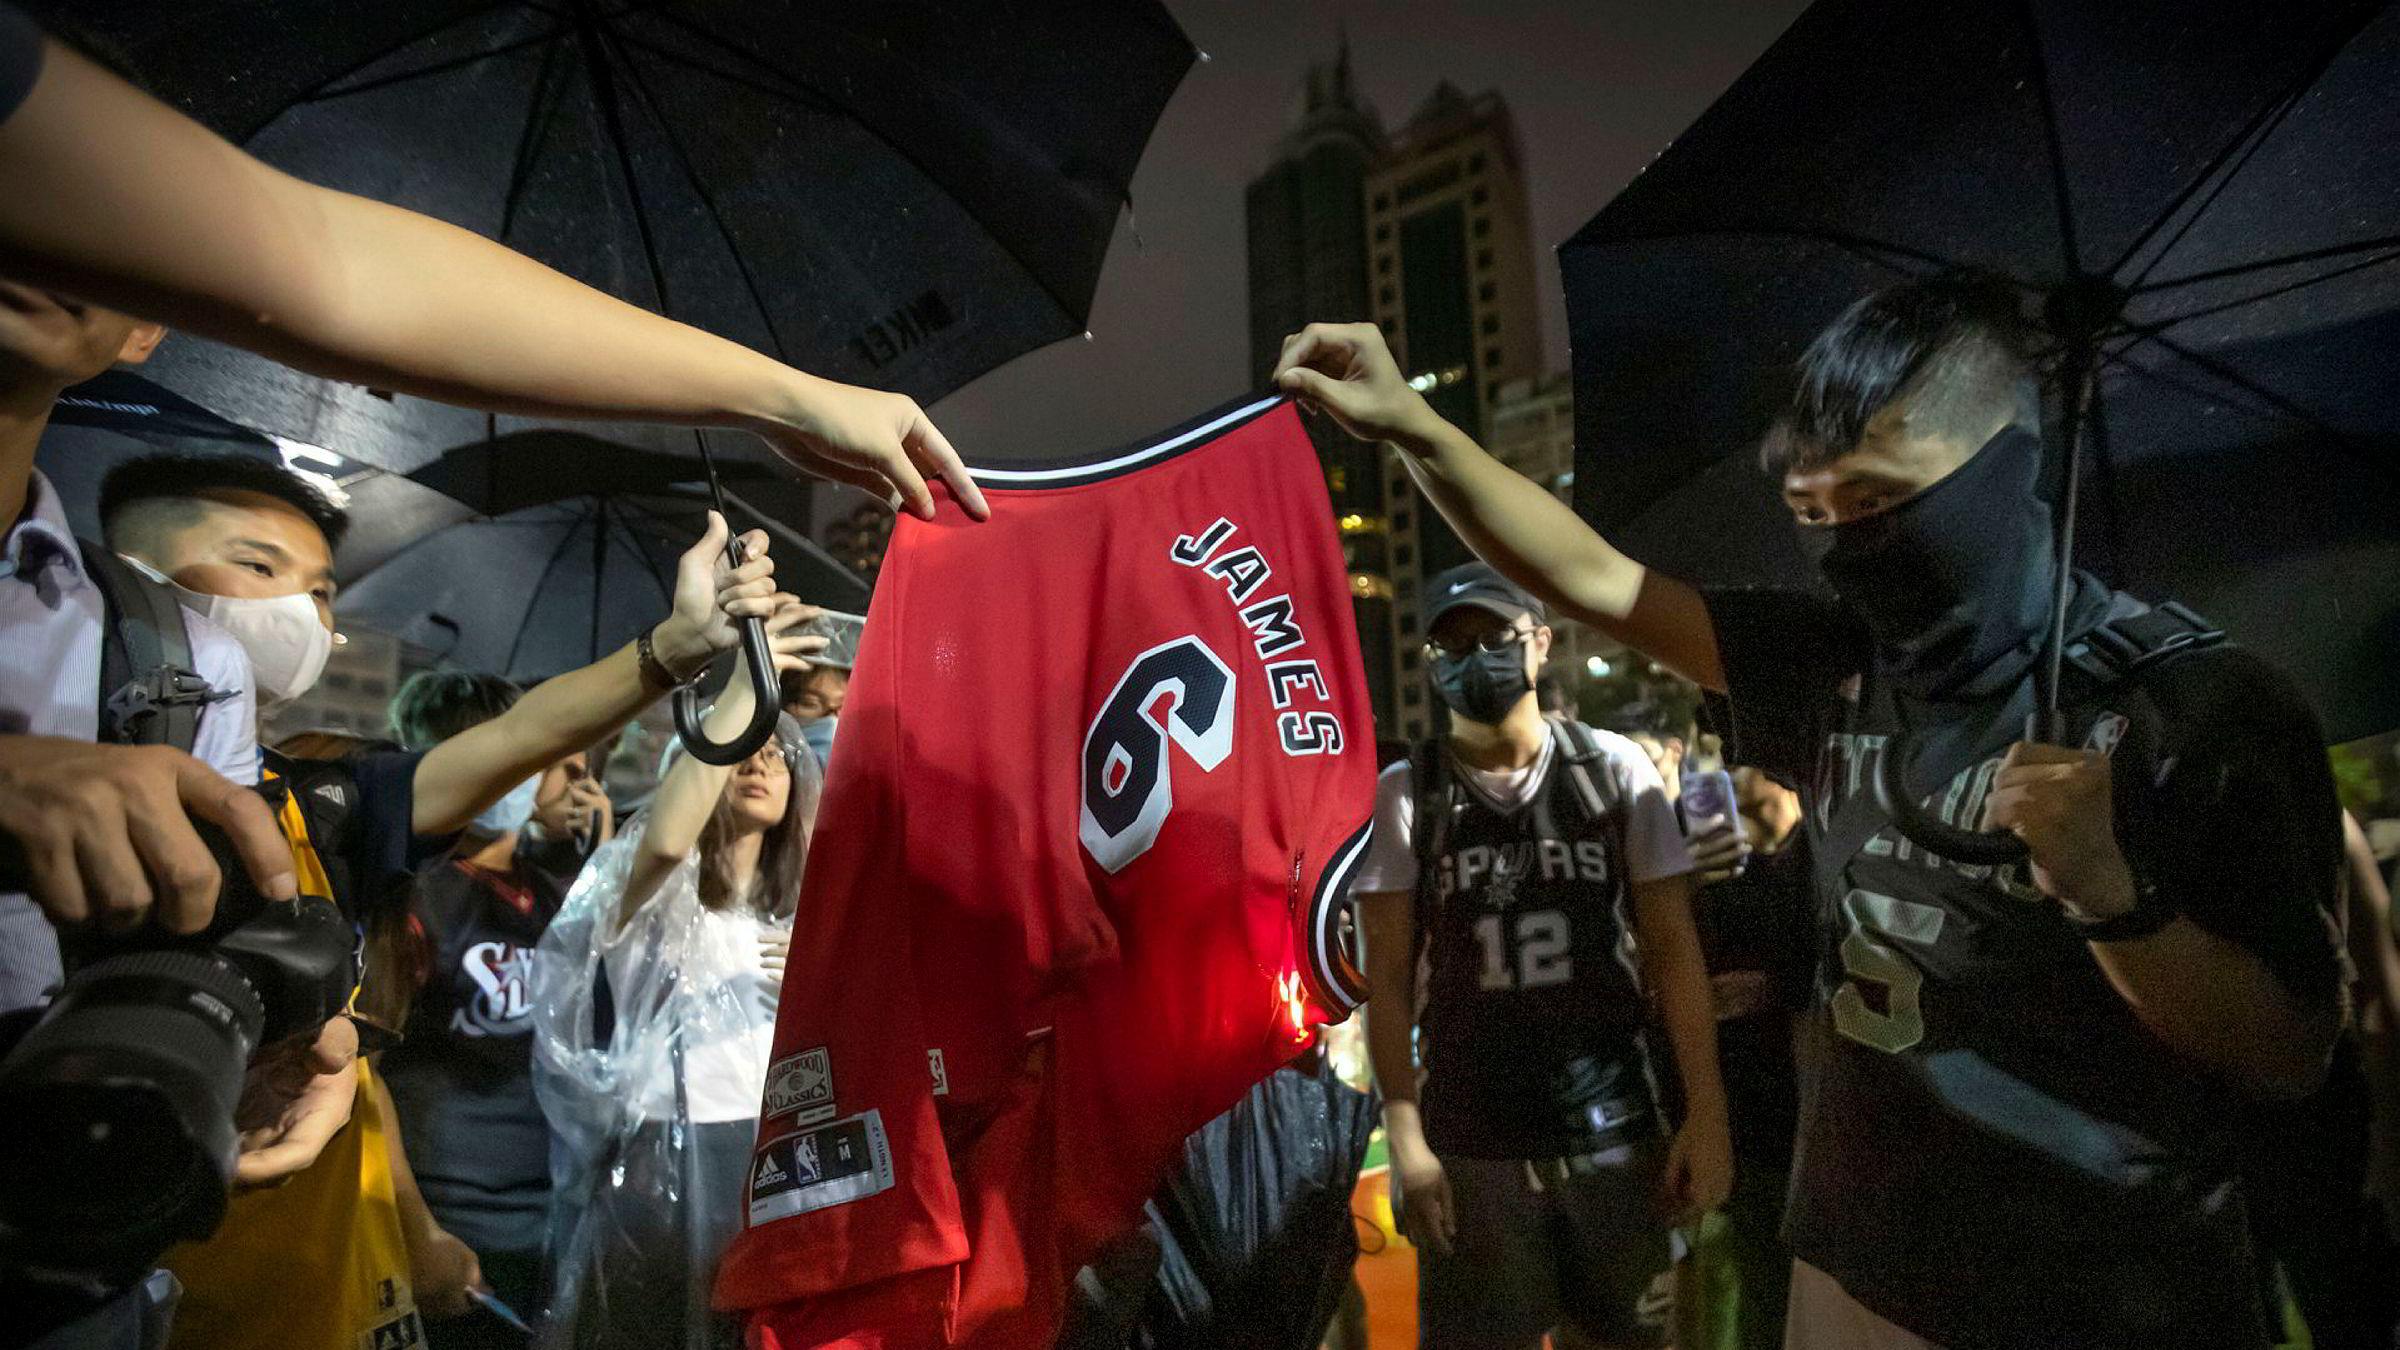 Demonstranter i Hongkong har brent trøyer med lagnummeret og navnet til den amerikanske basketballstjernen LeBron James.